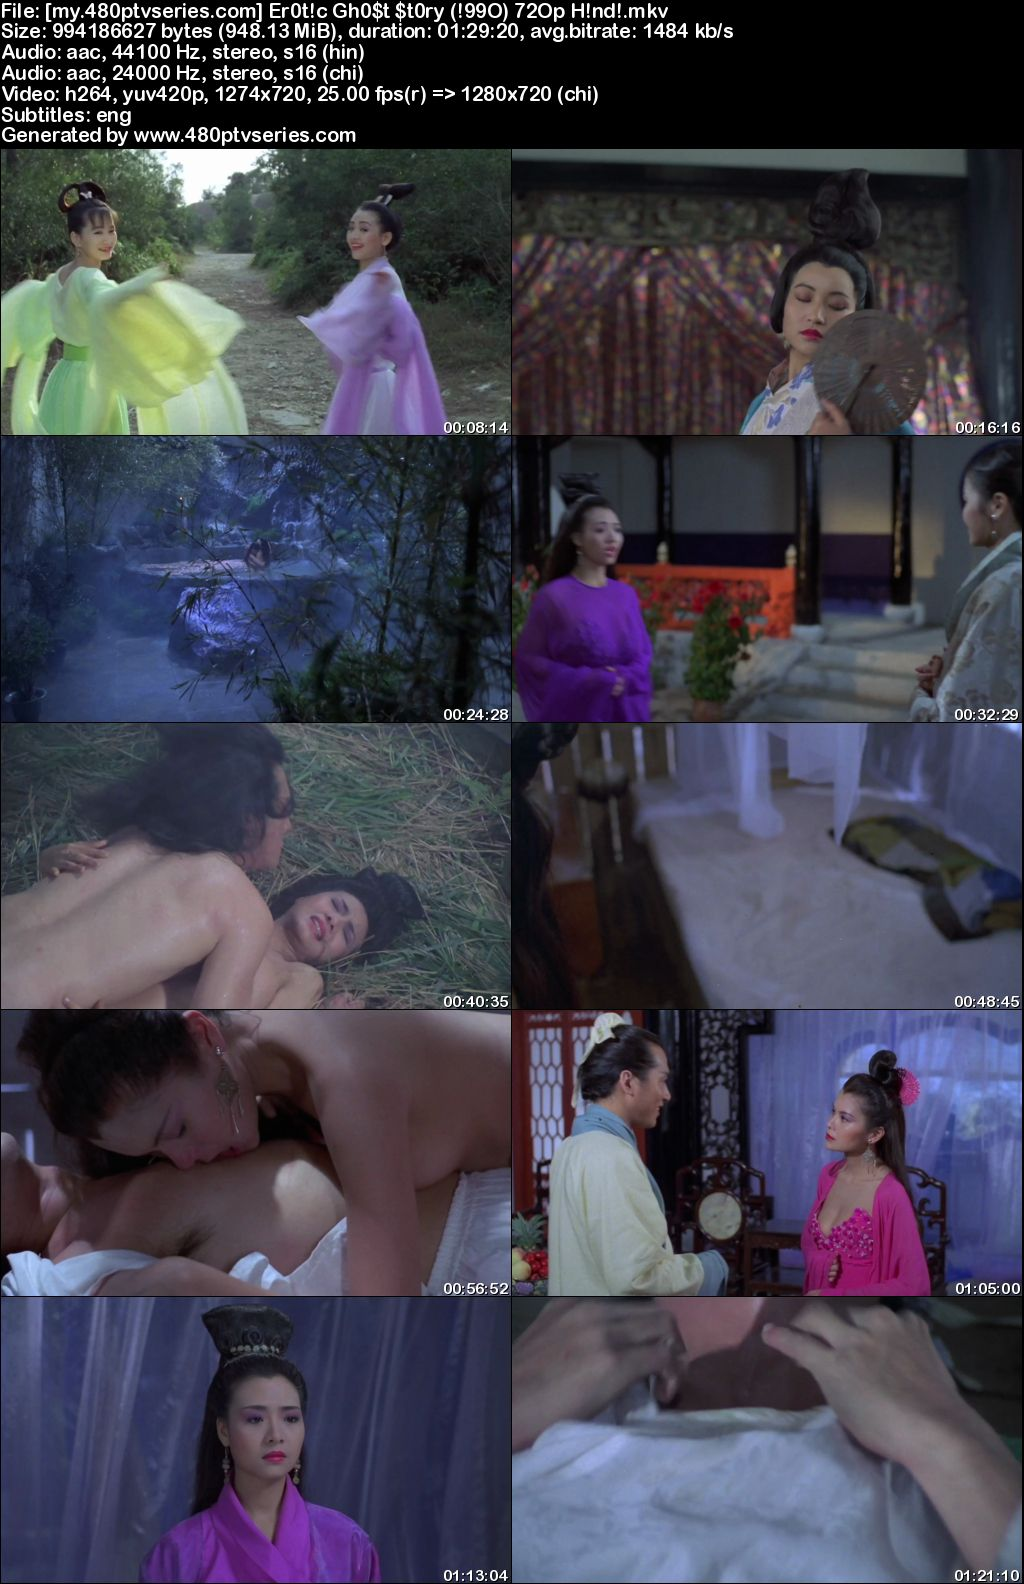 Watch Online Free Erotic Ghost Story (1990) Full Hindi Dual Audio Movie Download 480p 720p Bluray